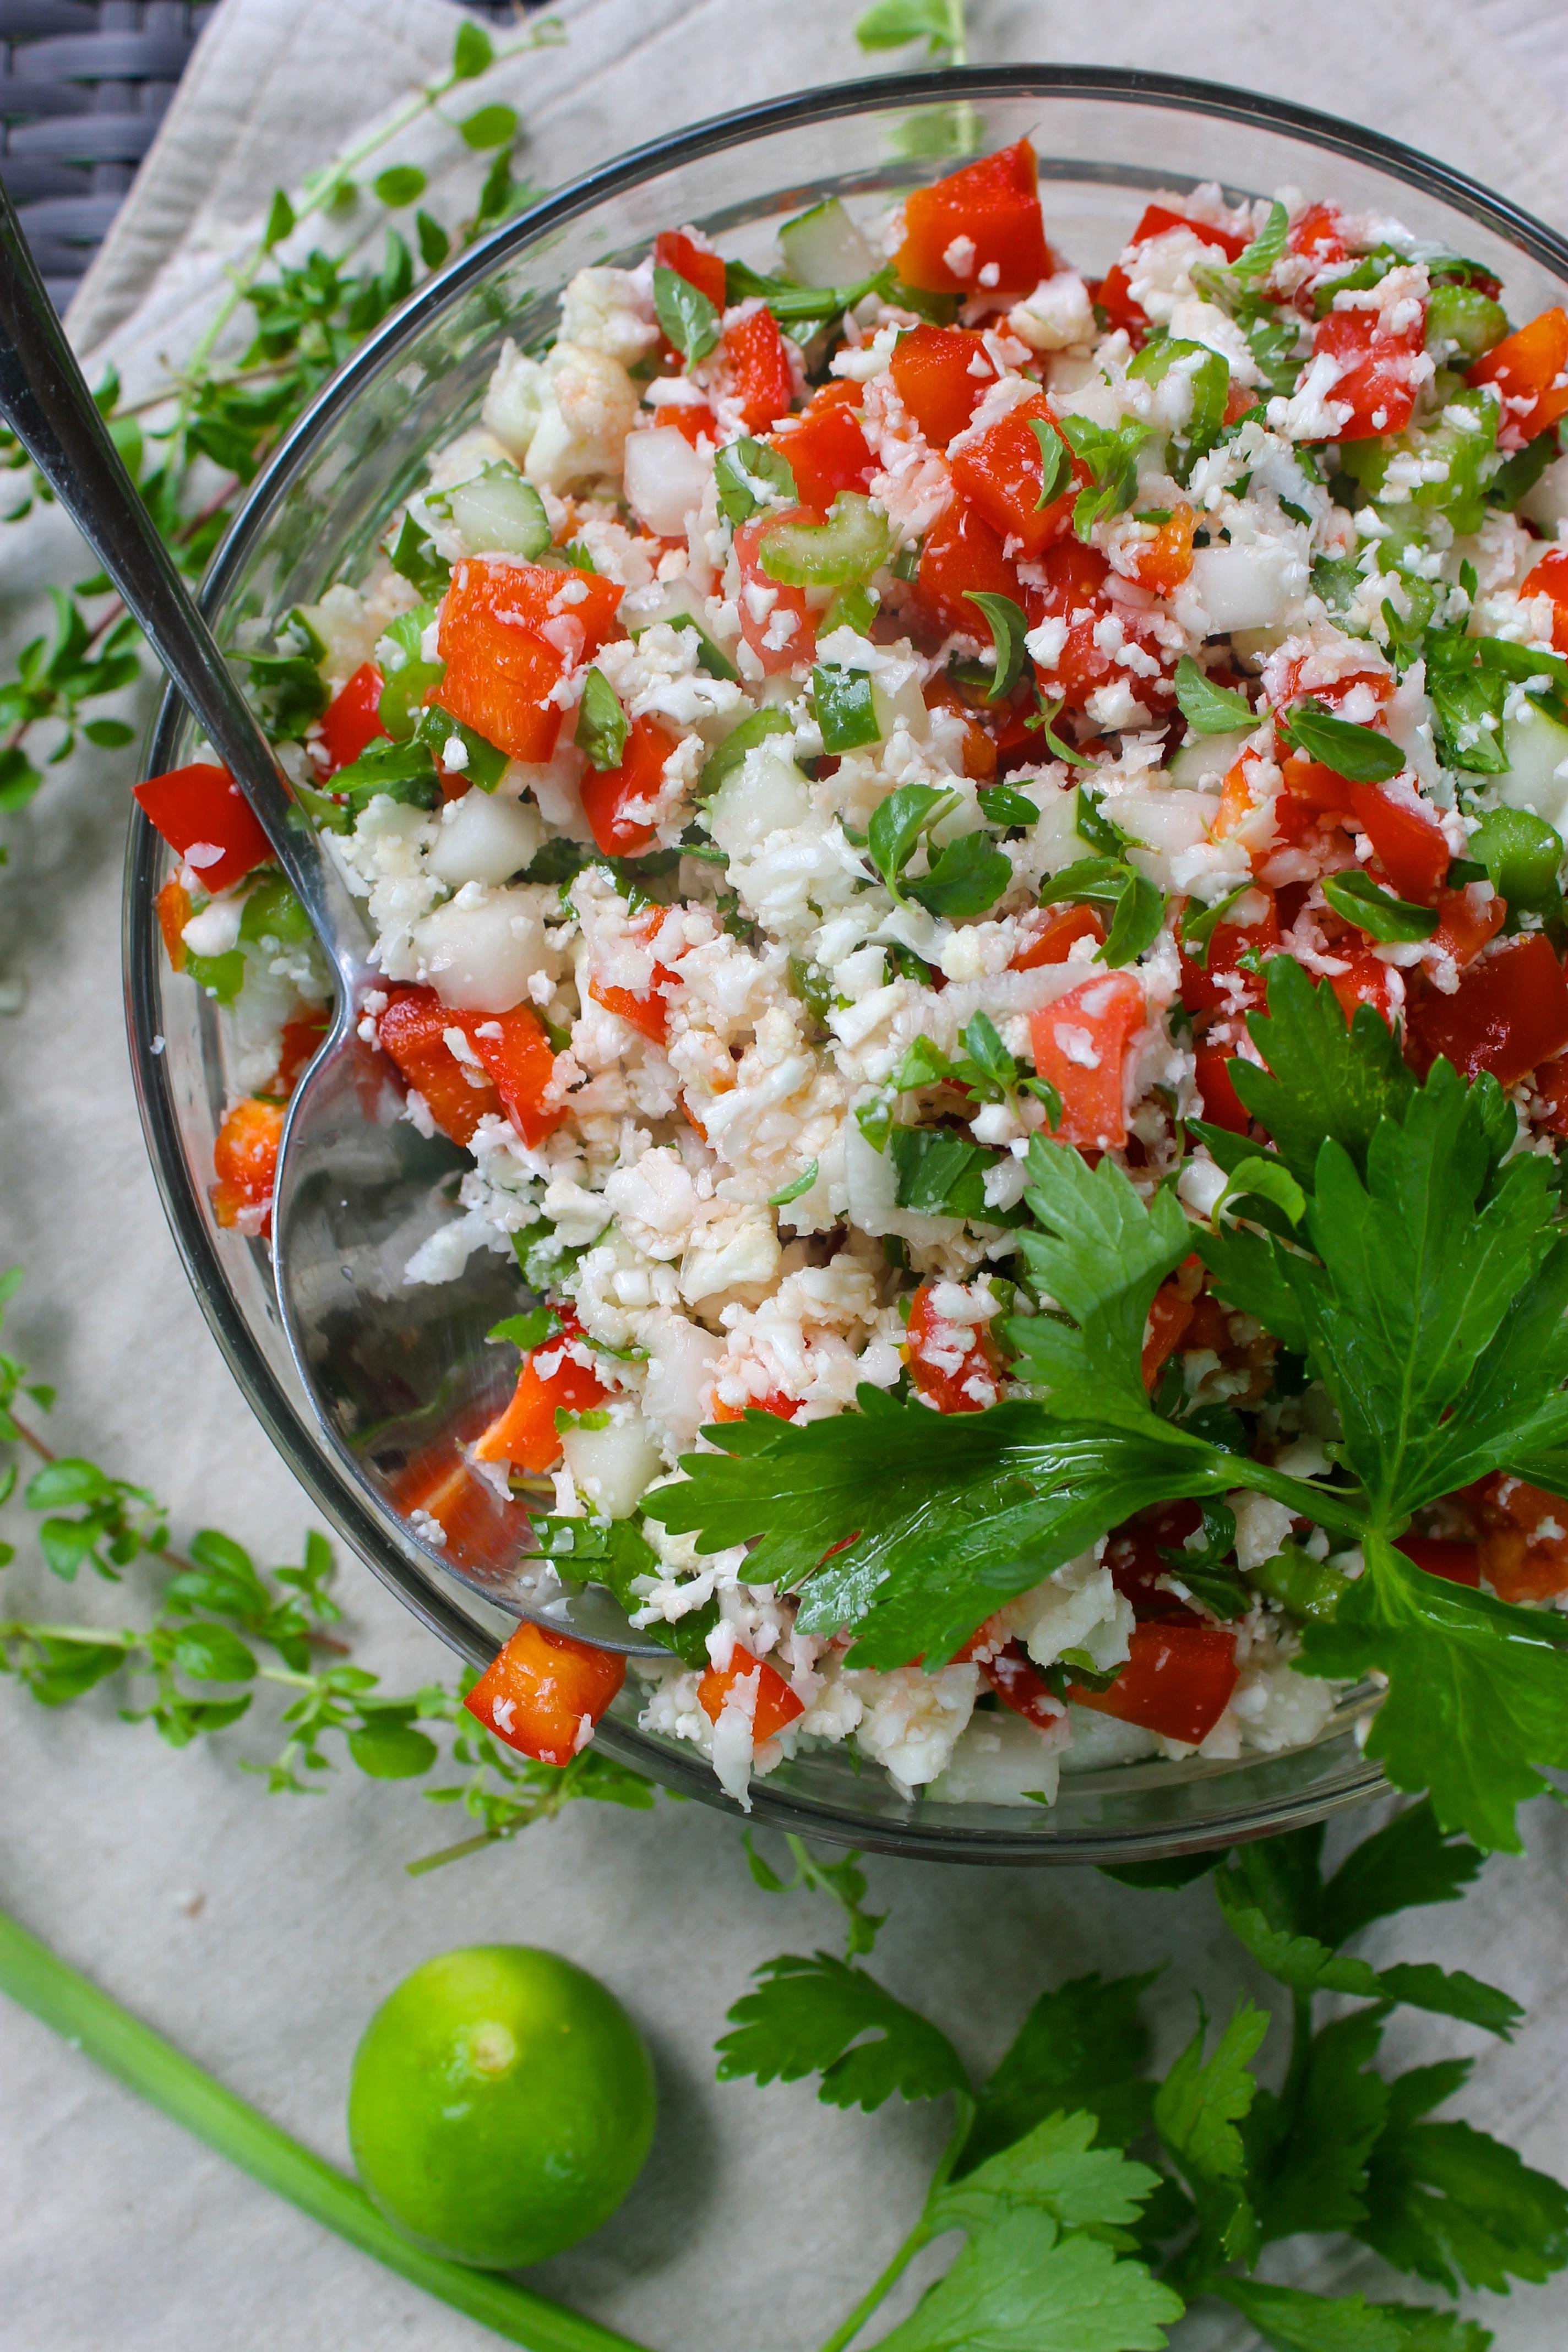 Mint & Pineapple Cauliflower Tabbouleh